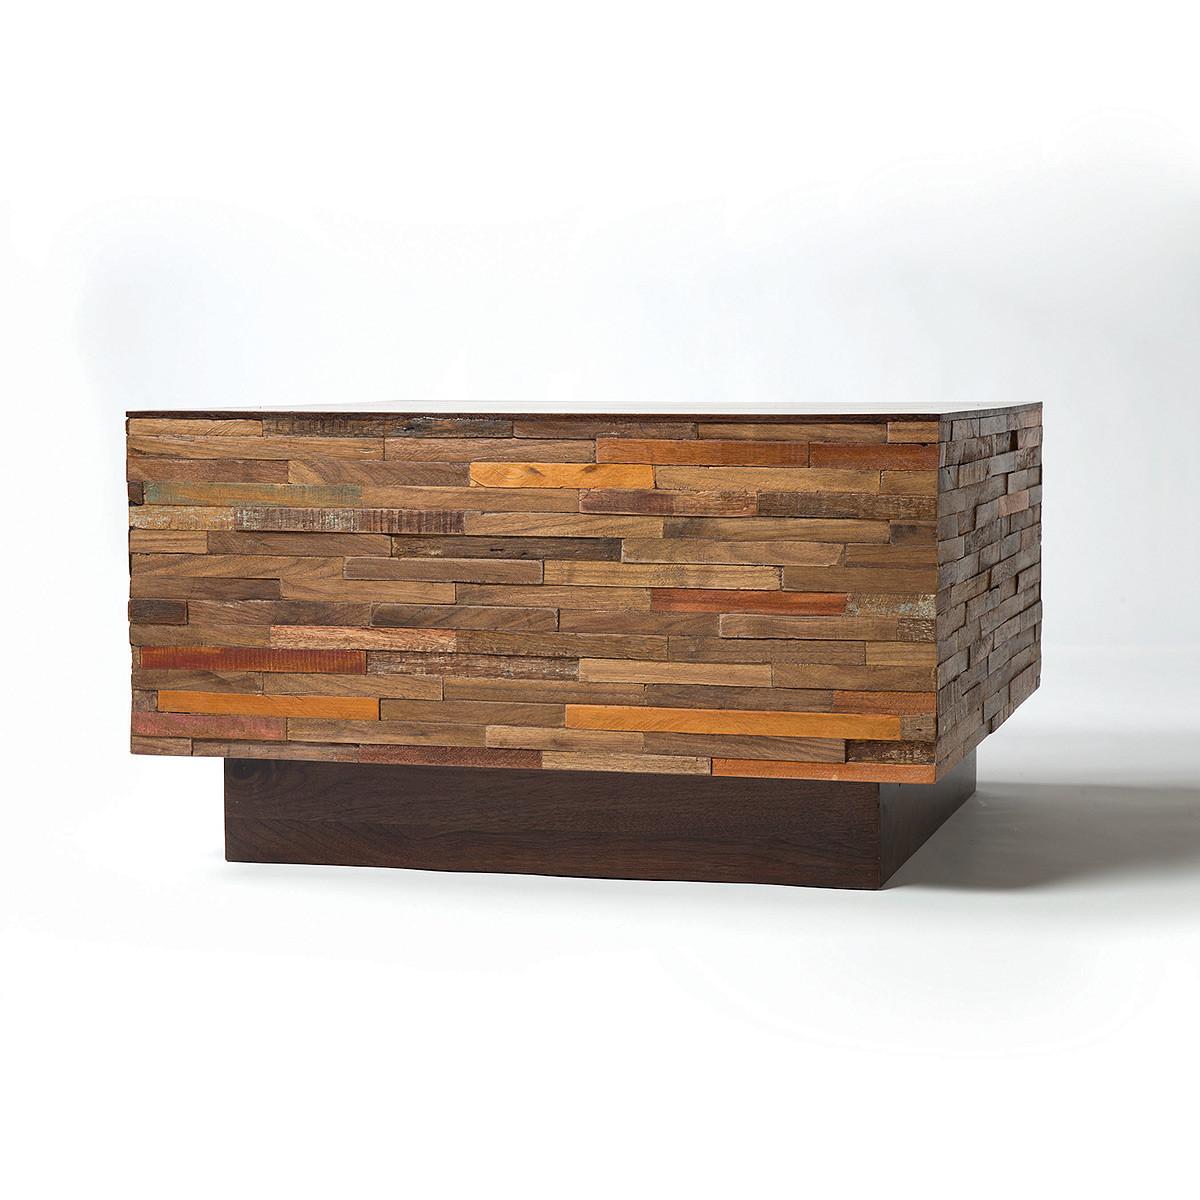 landon mixed reclaimed wood square coffee table - Reclaimed Wood Coffee Tables. Copenhagen Reclaimed Wood Coffee